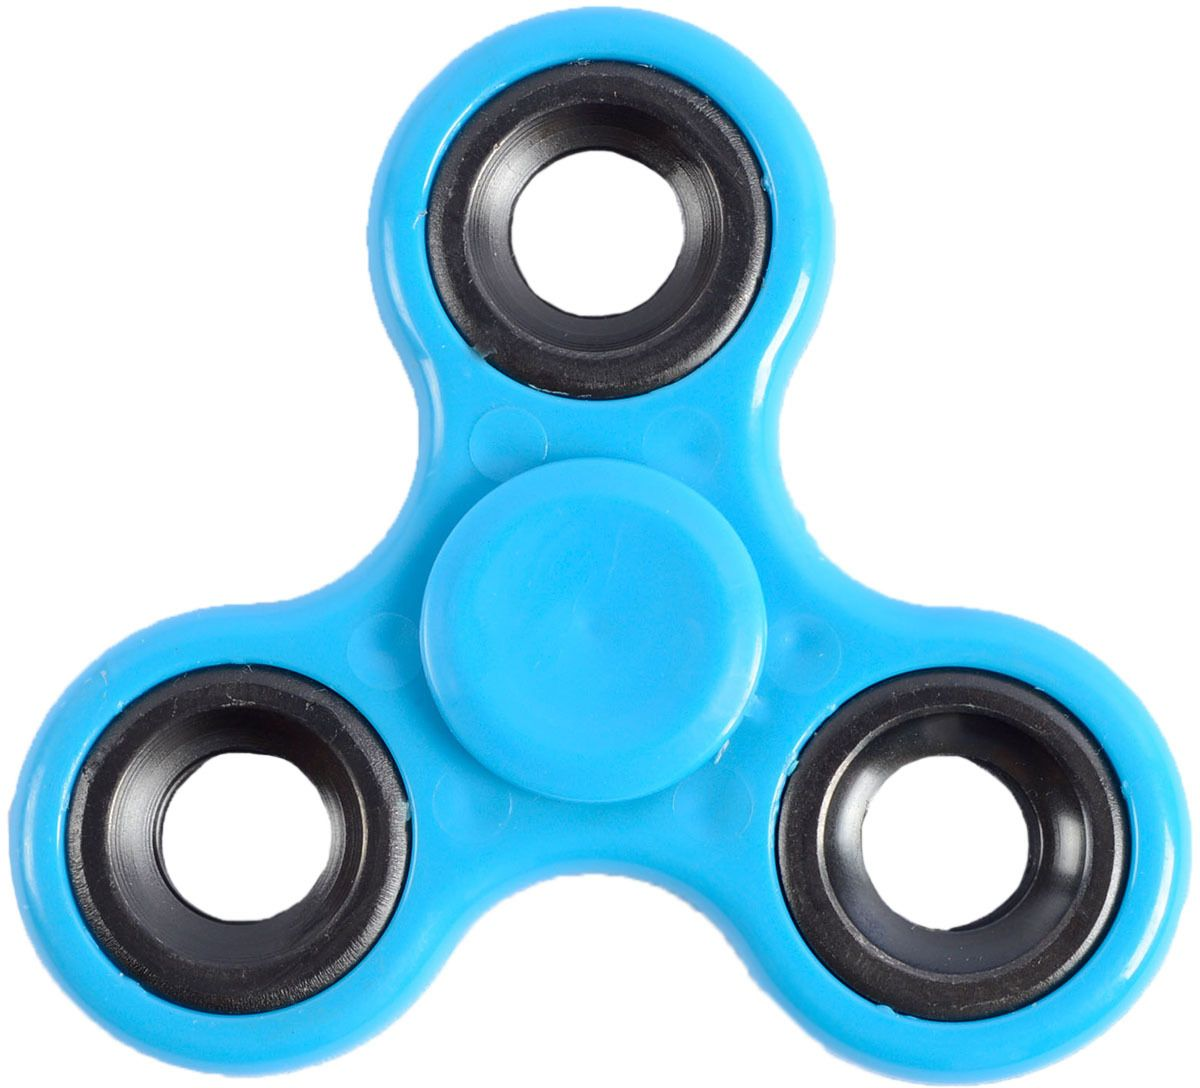 Fidget Spinner Спиннер Gyro цвет синий спиннер fidget spinner megamind м7261 luminious light blue